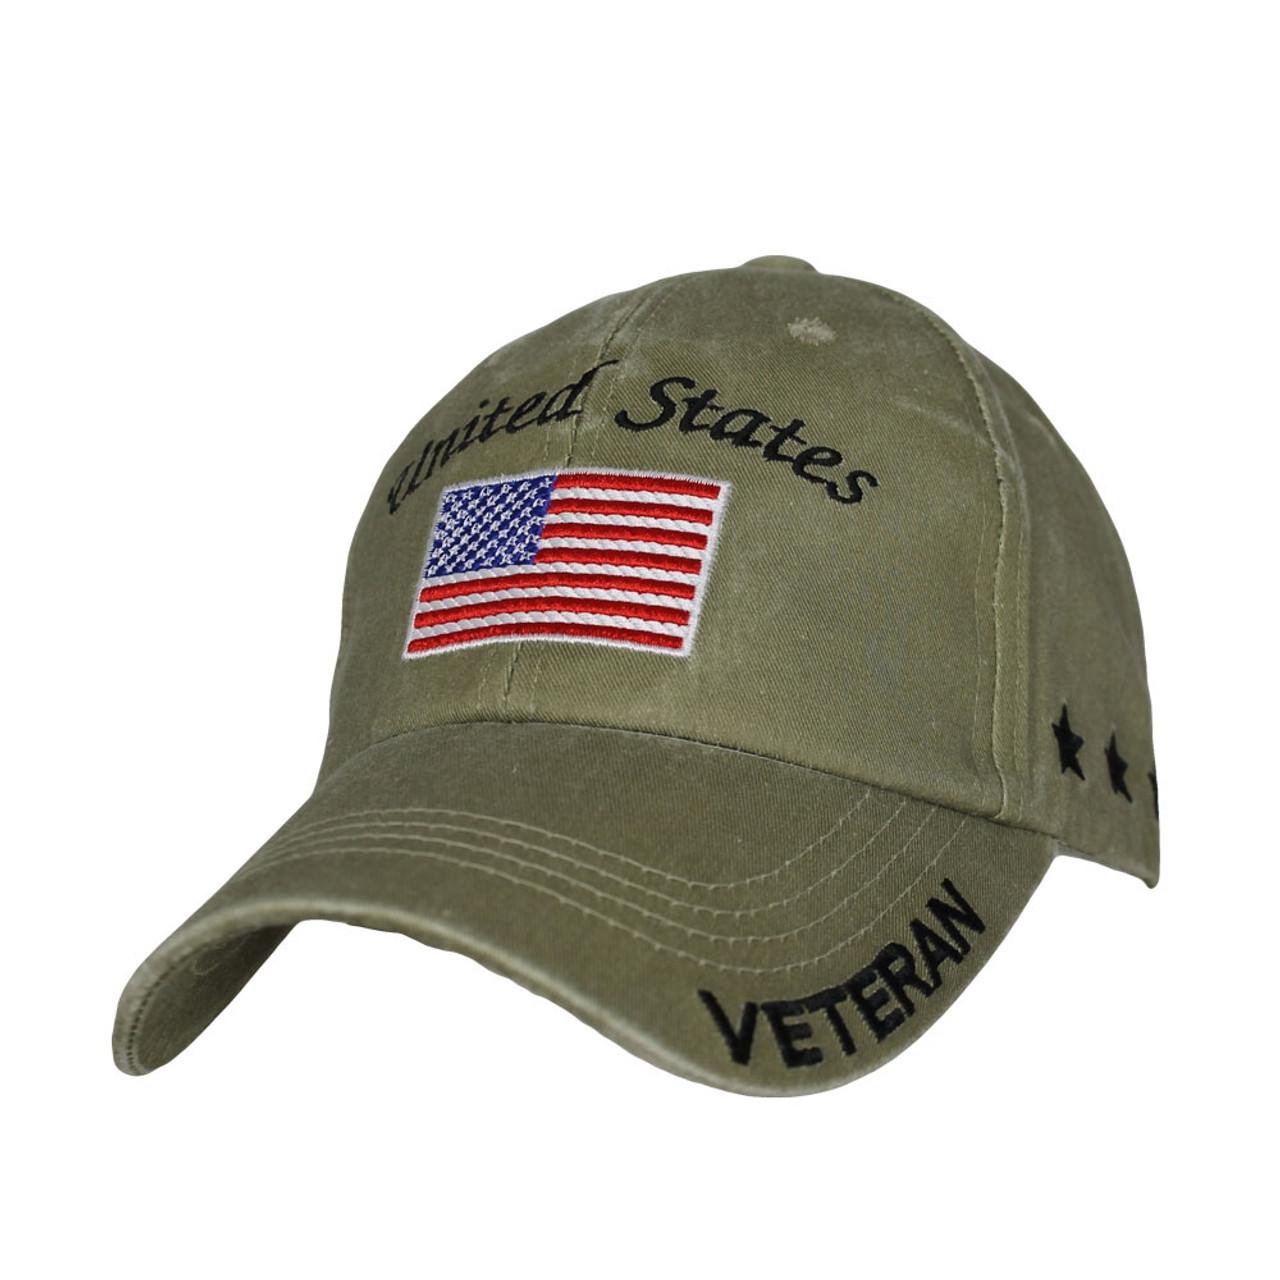 0e1c287942a78 US Military Veteran - U.S. Military with Flag Khaki Baseball Cap Hat